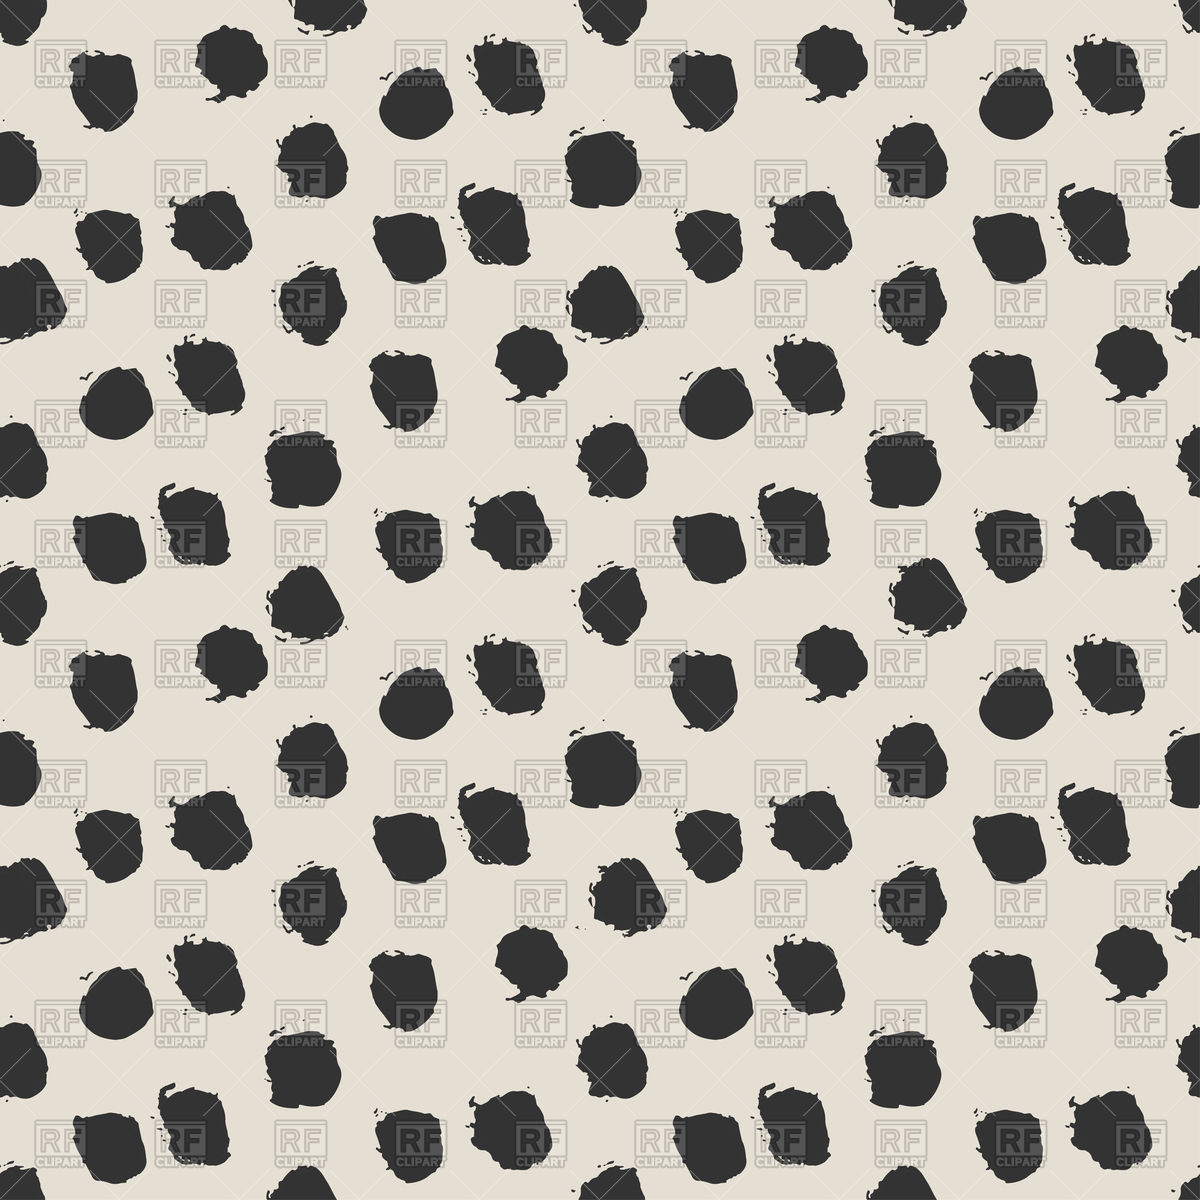 1200x1200 Seamless Ink Brush Painted Polka Dot Pattern Royalty Free Vector